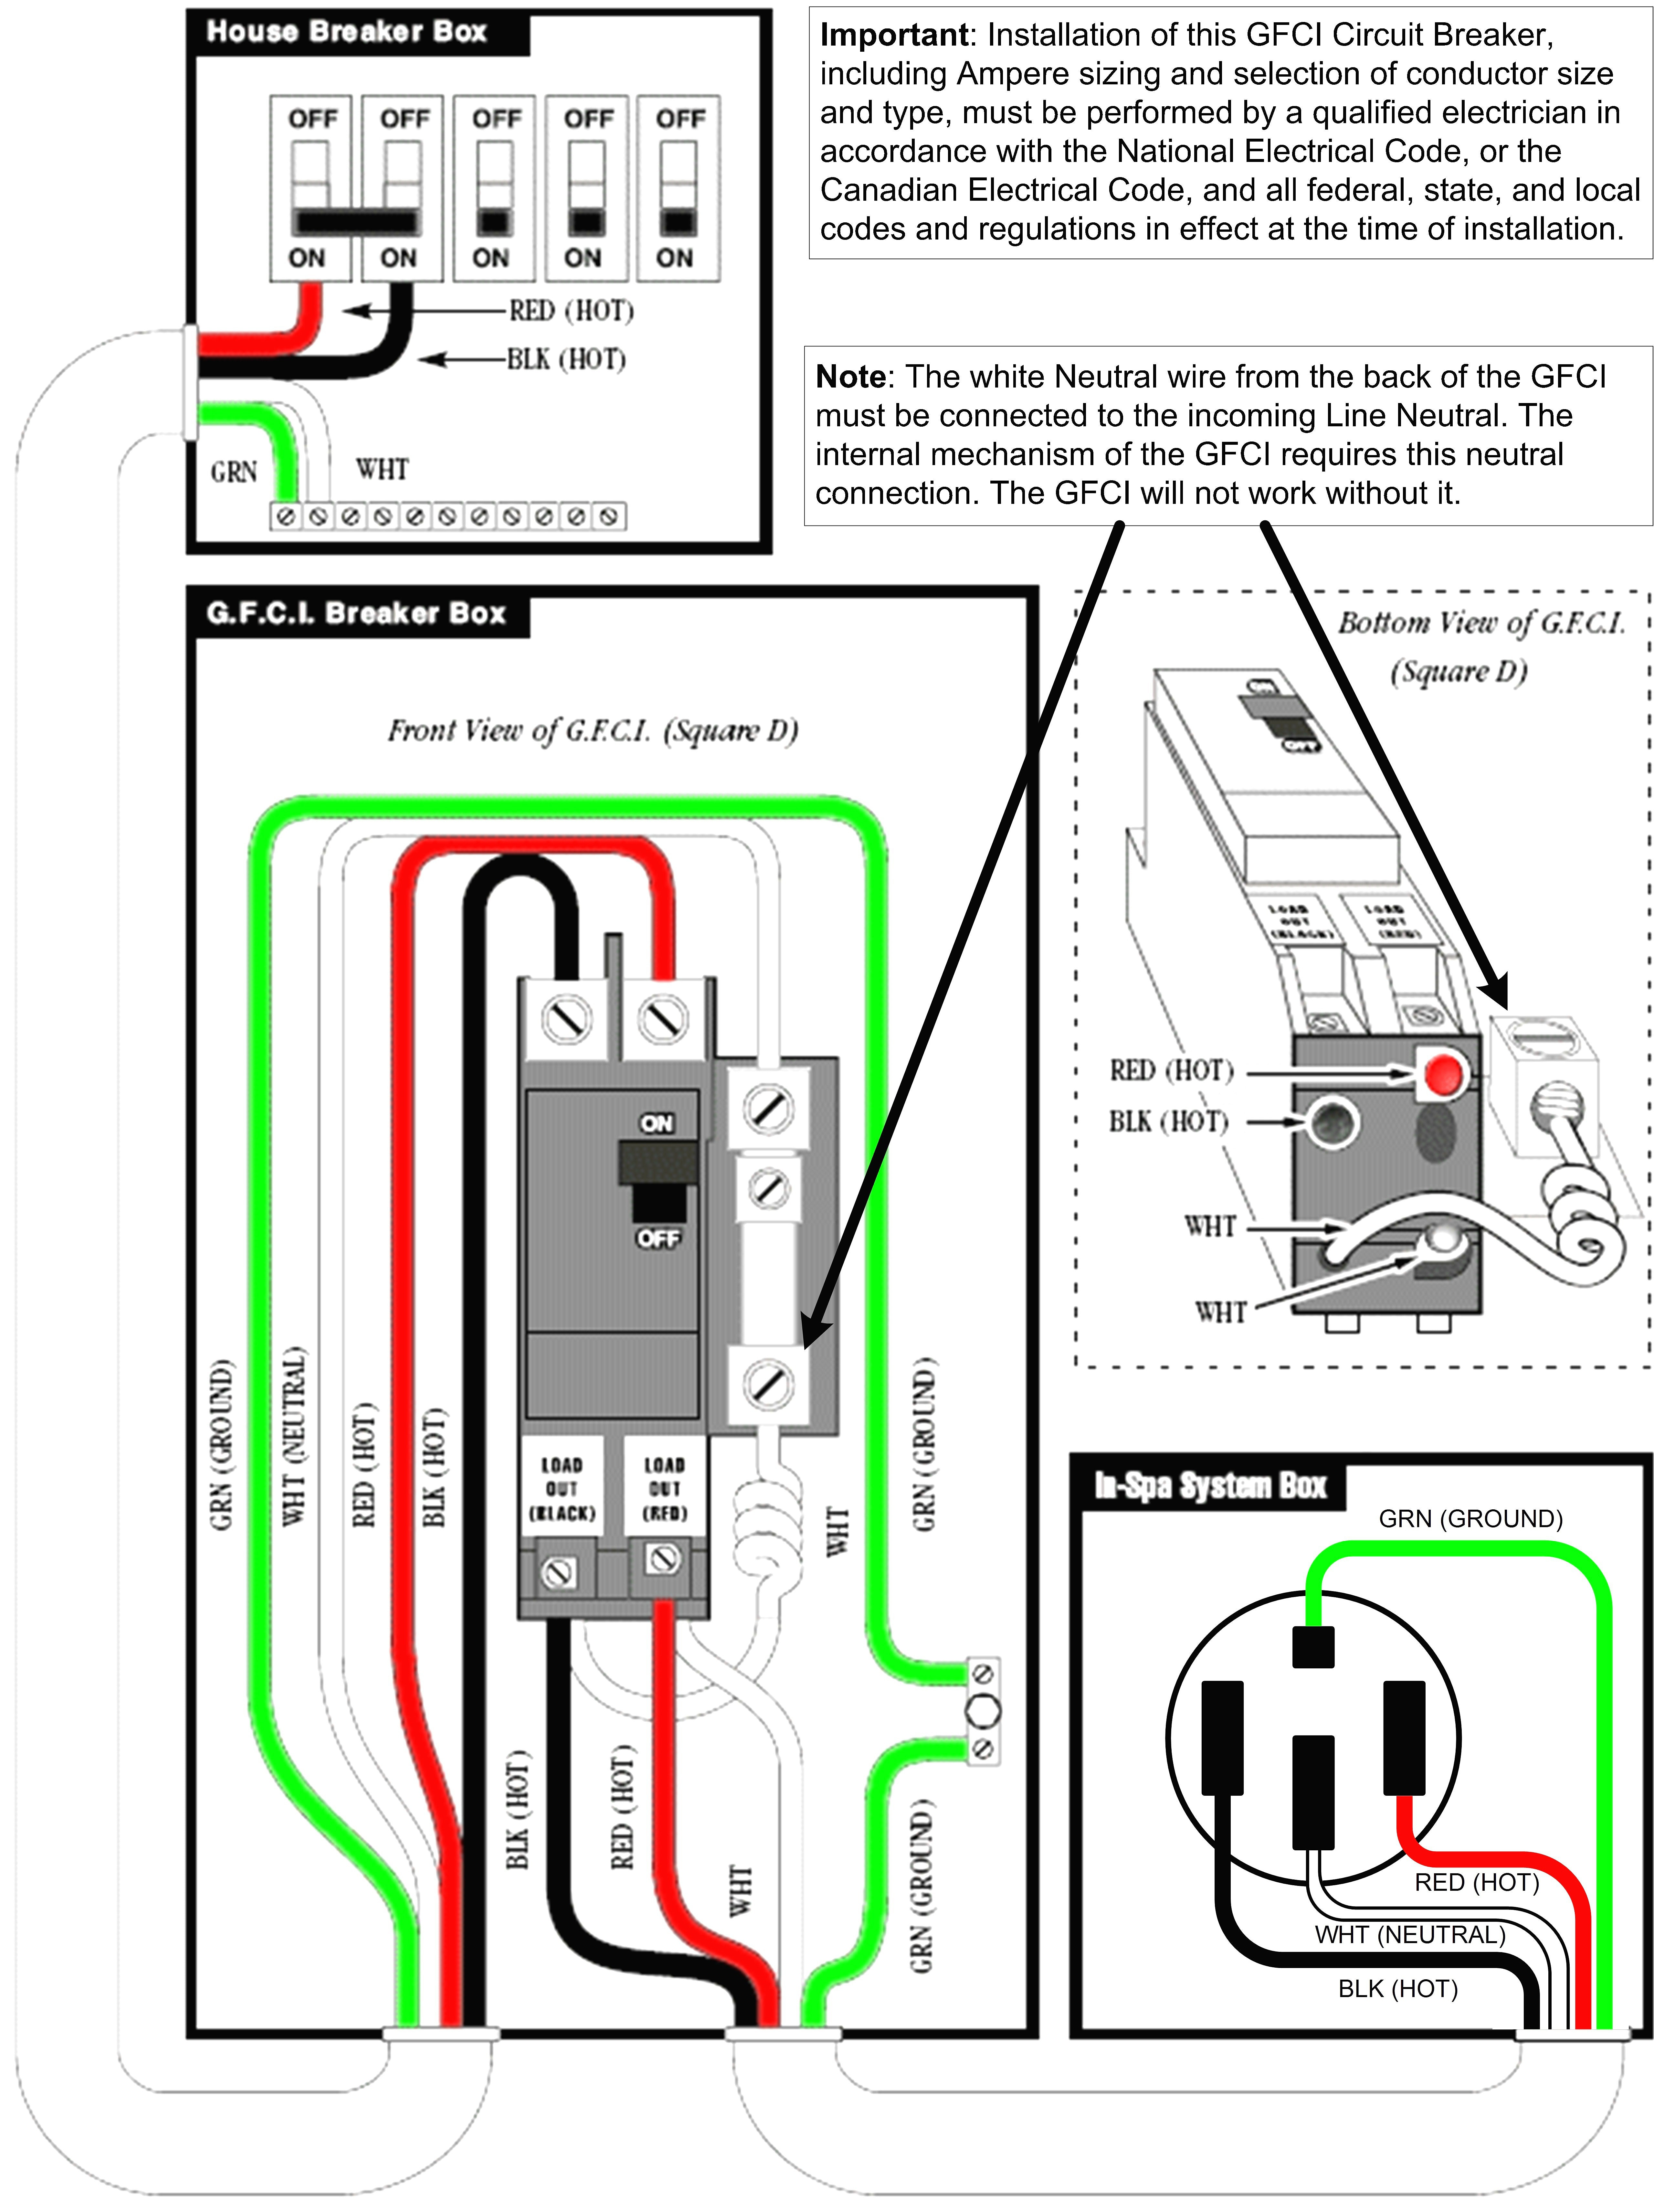 4 Wire 240V Plug Wiring - Wiring Diagrams Hubs - 240V Plug Wiring Diagram